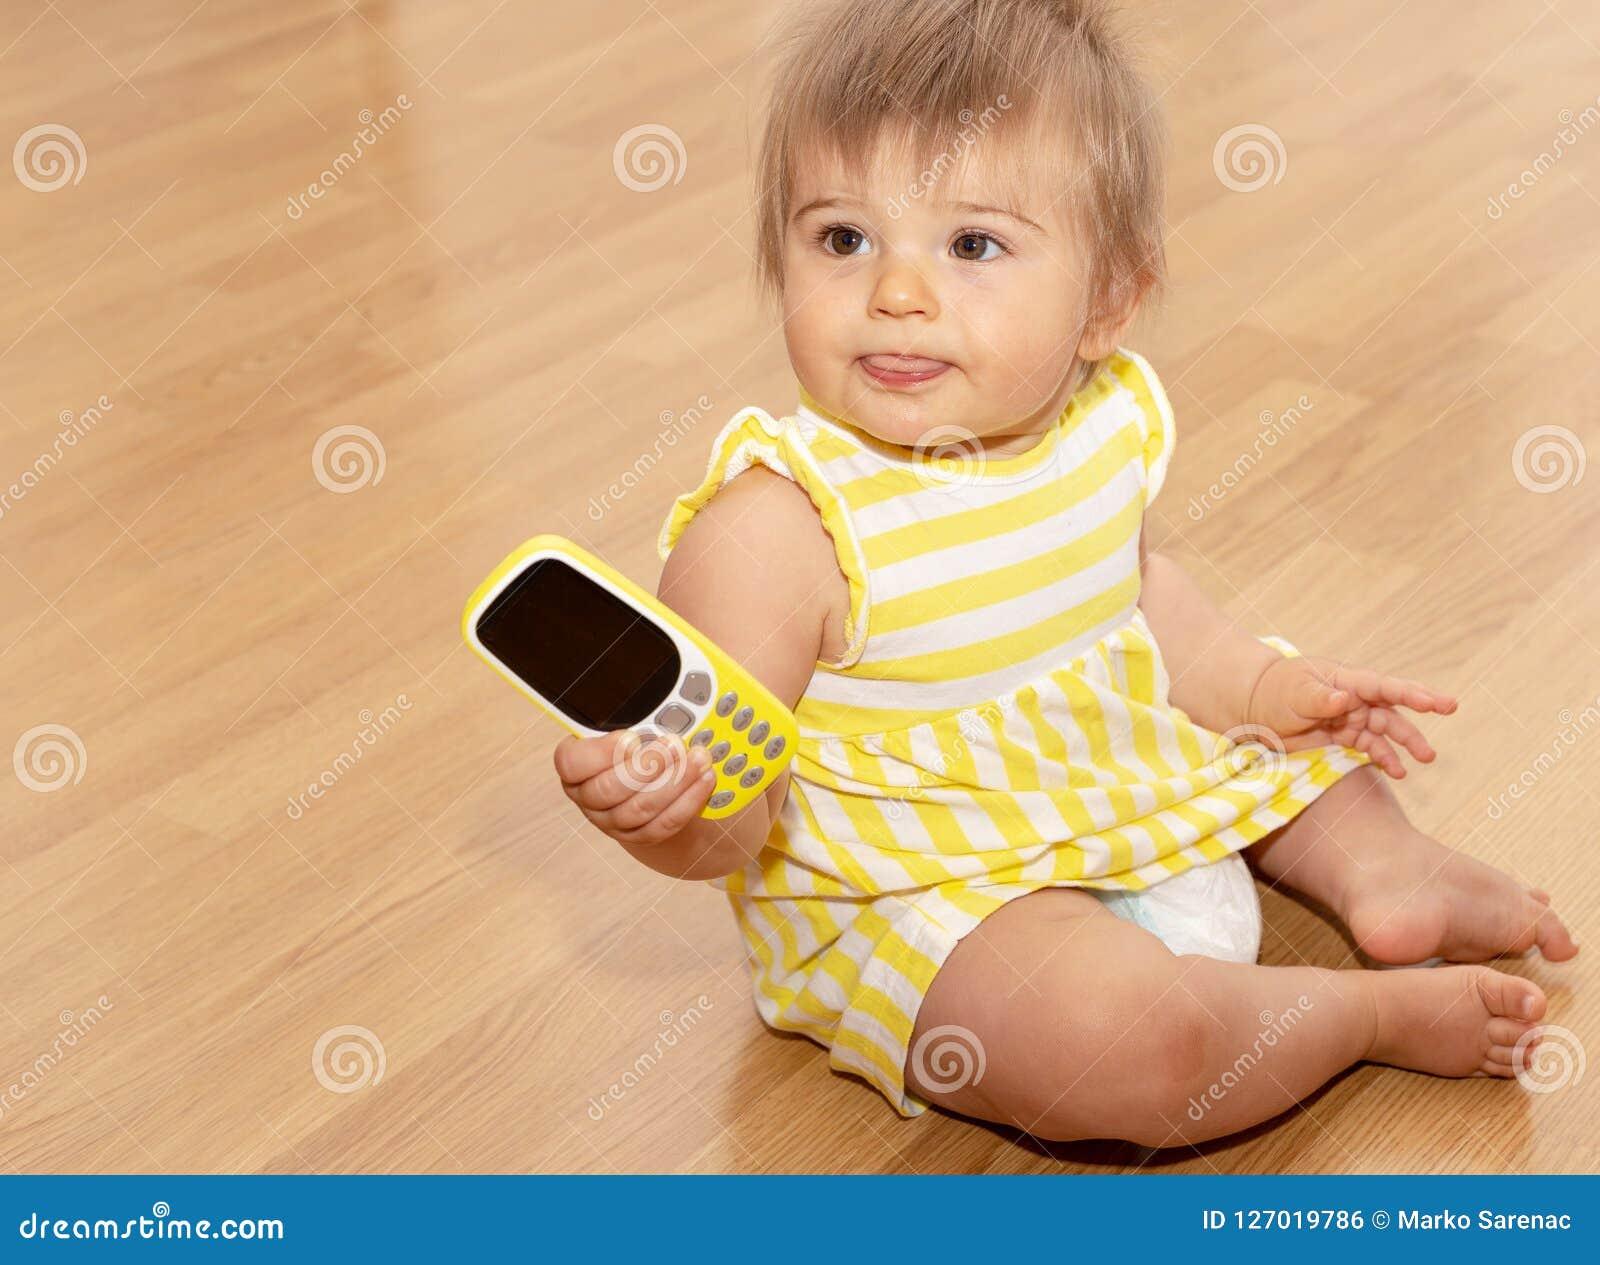 Baby Girl Phone Yellow Dress Cute 5 Stock Photo Image Of Child Happiness 127019786